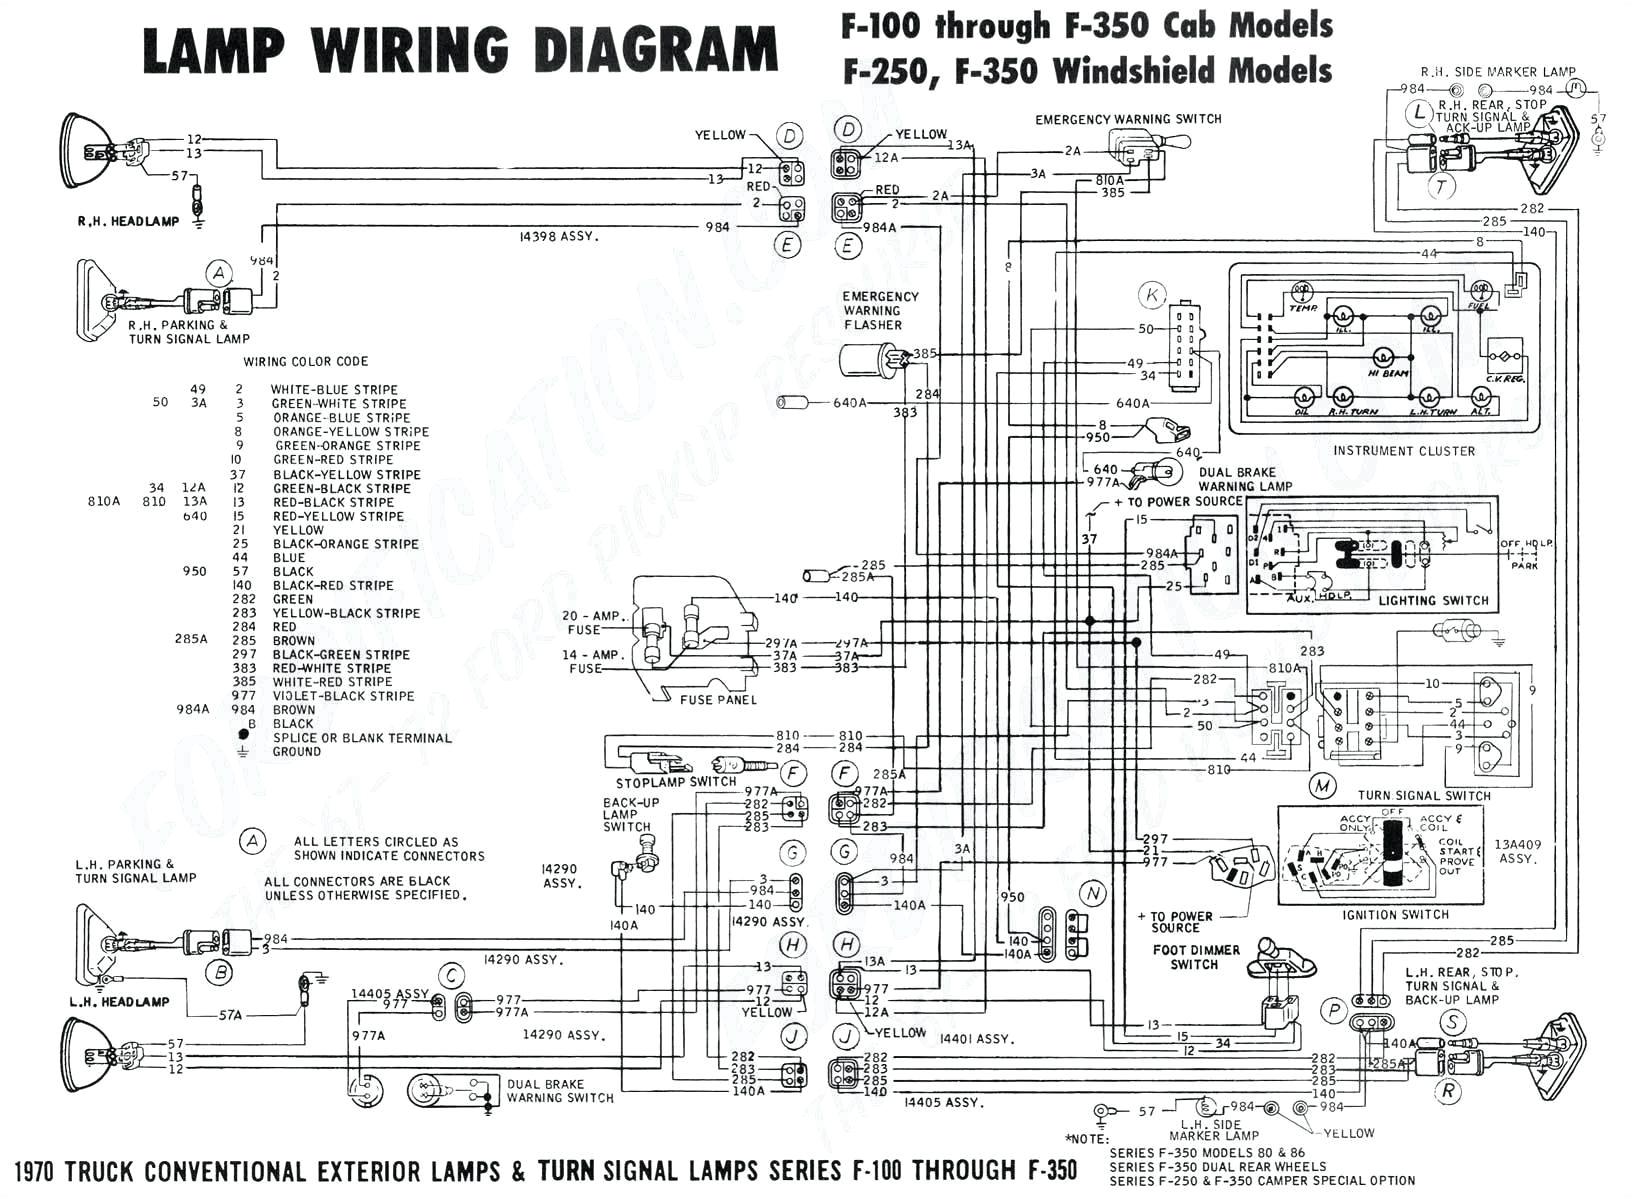 1996 ford wiring diagram wiring diagram database ford f250 starter solenoid wiring diagram